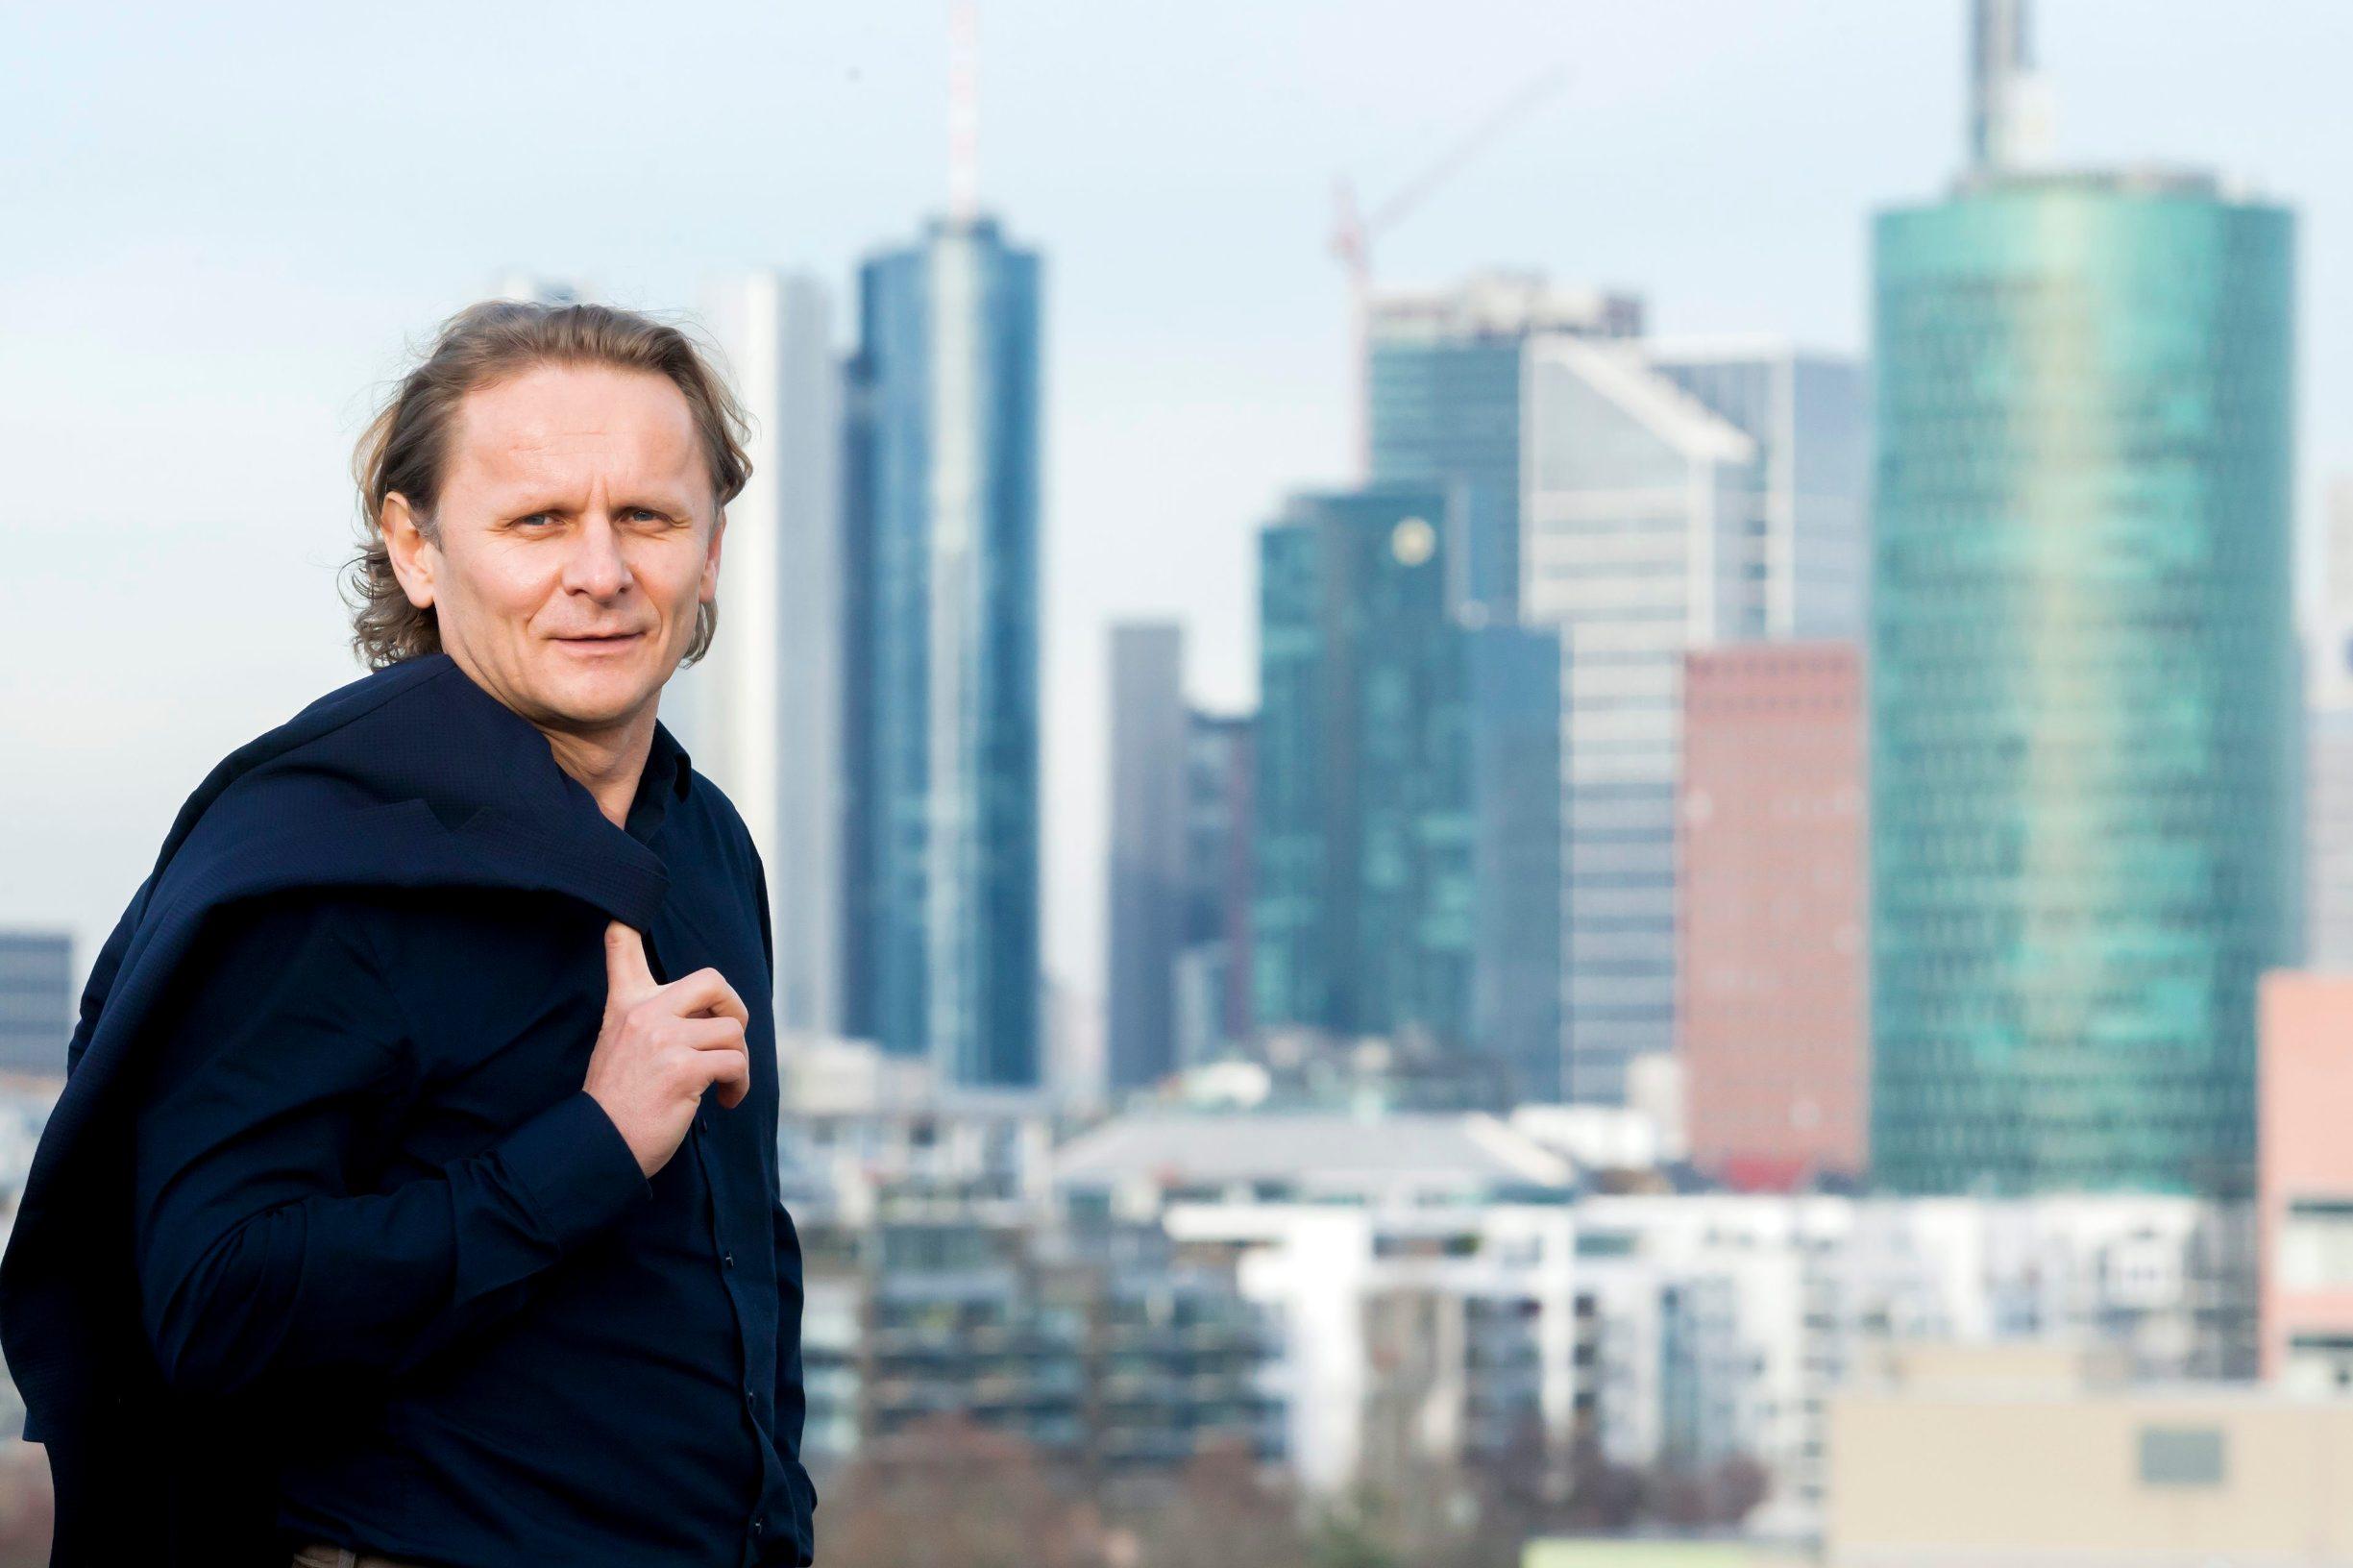 Frankfurt, 130219. Institut za biokemiju II. Na fotografiji: Ivan Djikic na krovu instituta. Foto: Tomislav Kristo / CROPIX